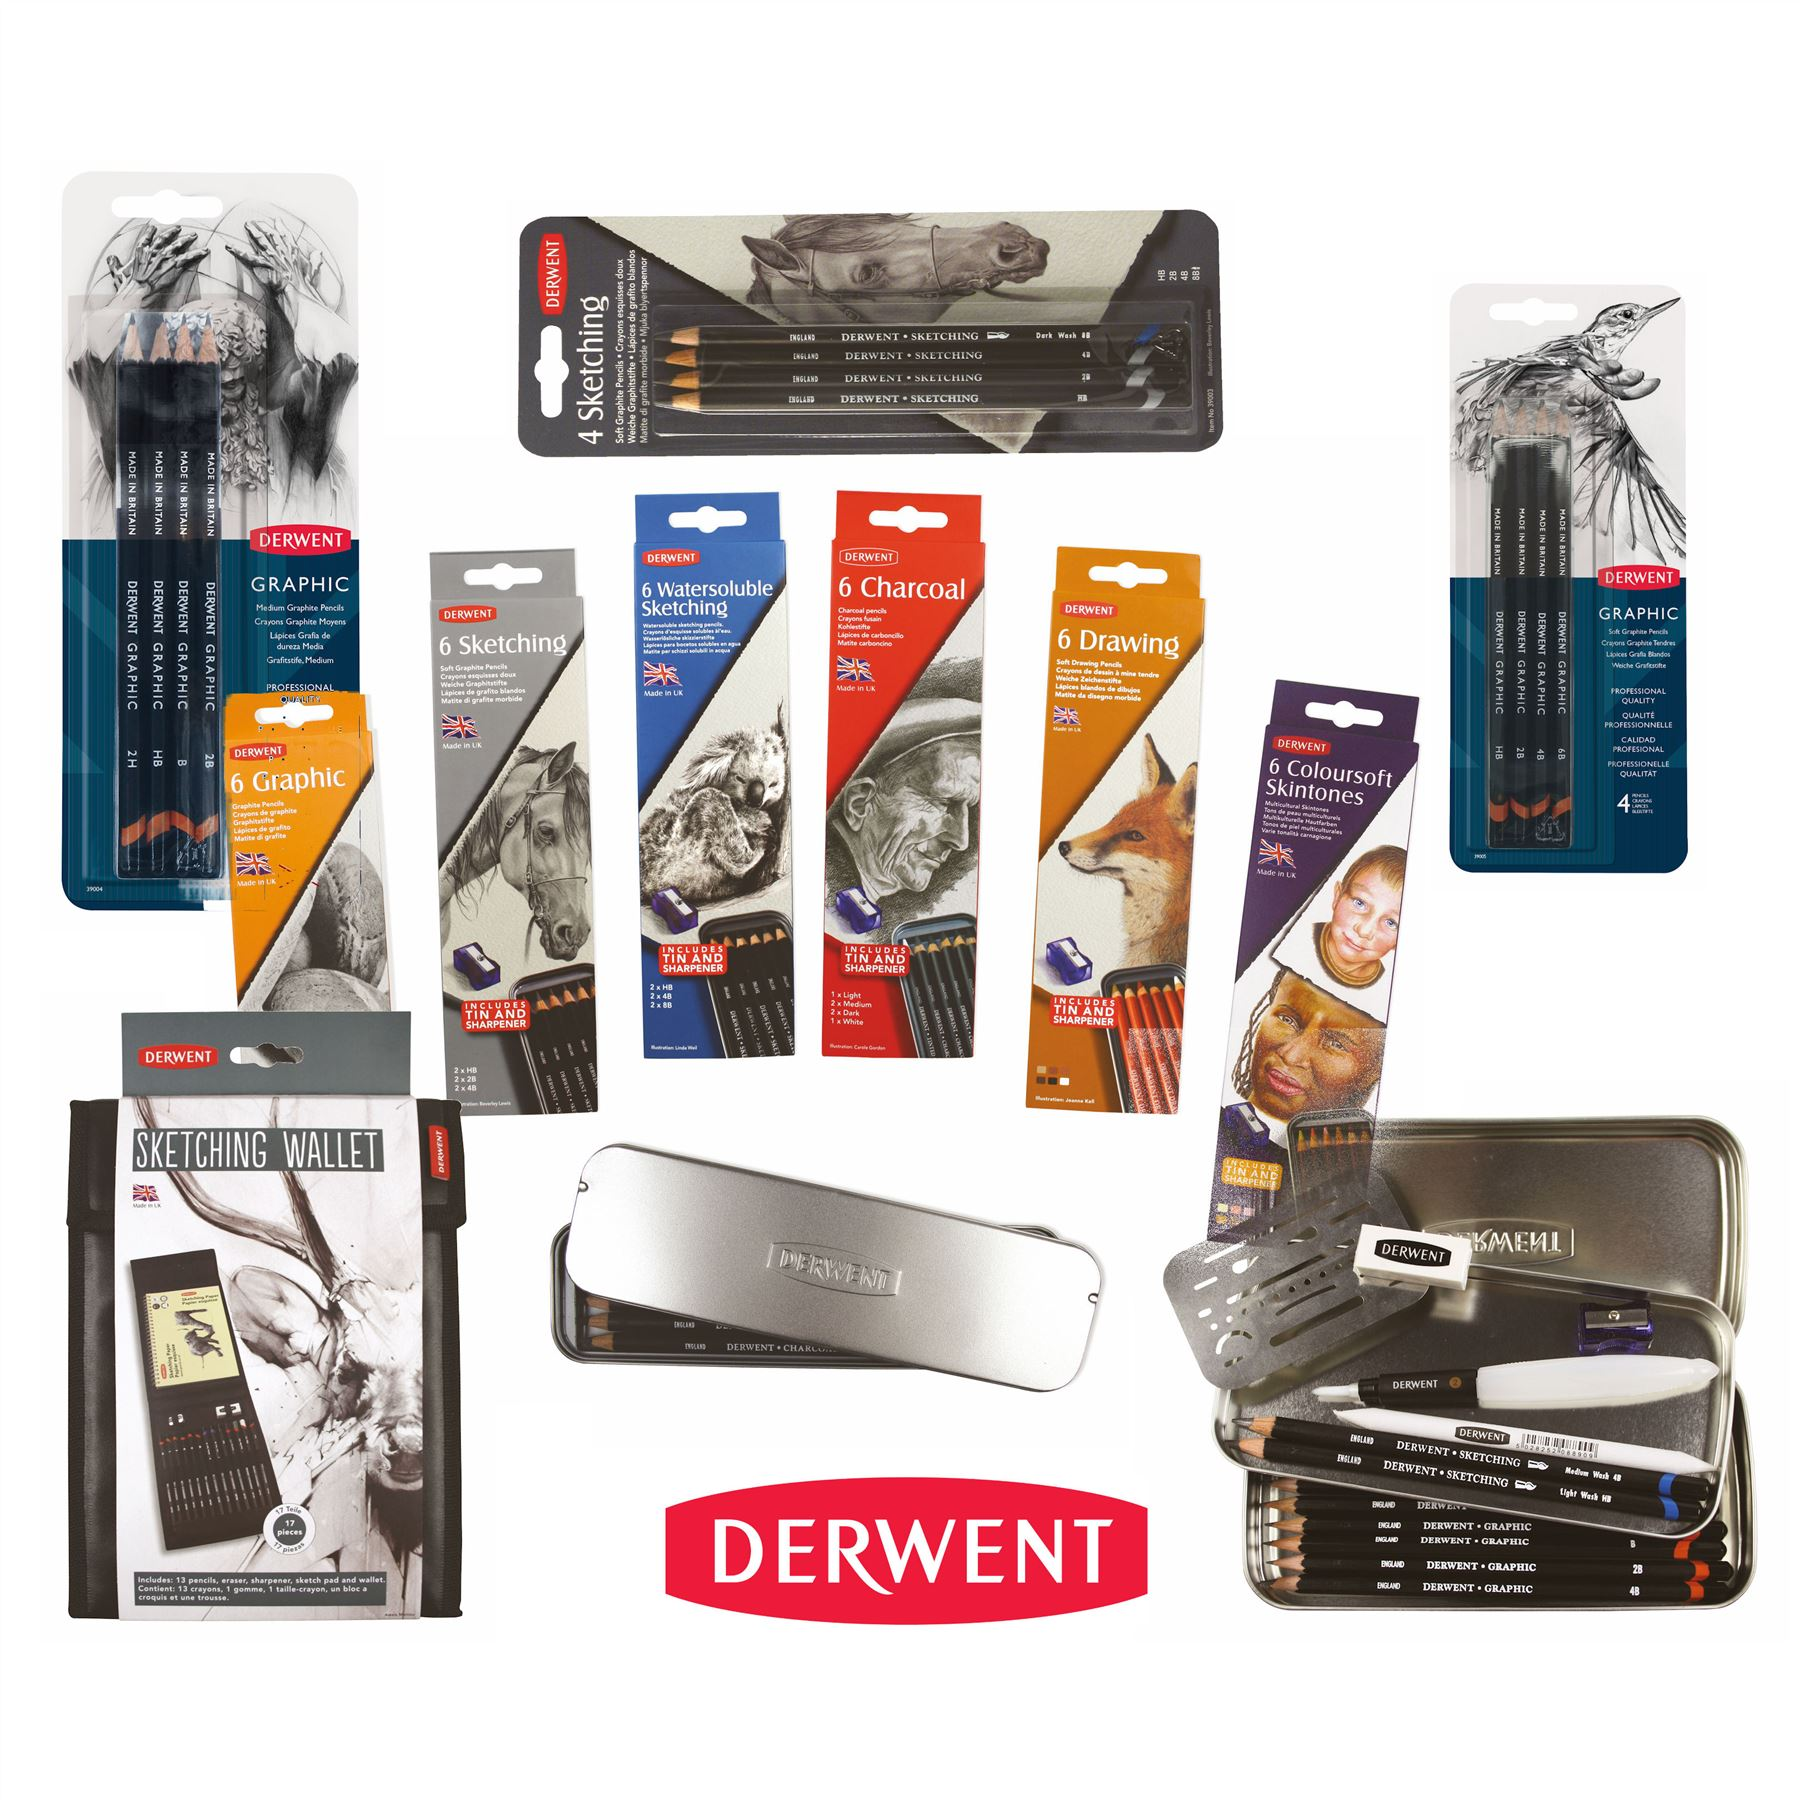 Derwent ProfessionalSketching Pencils 6 Tin Set of 2 x HB 4B with Sharpener 2B